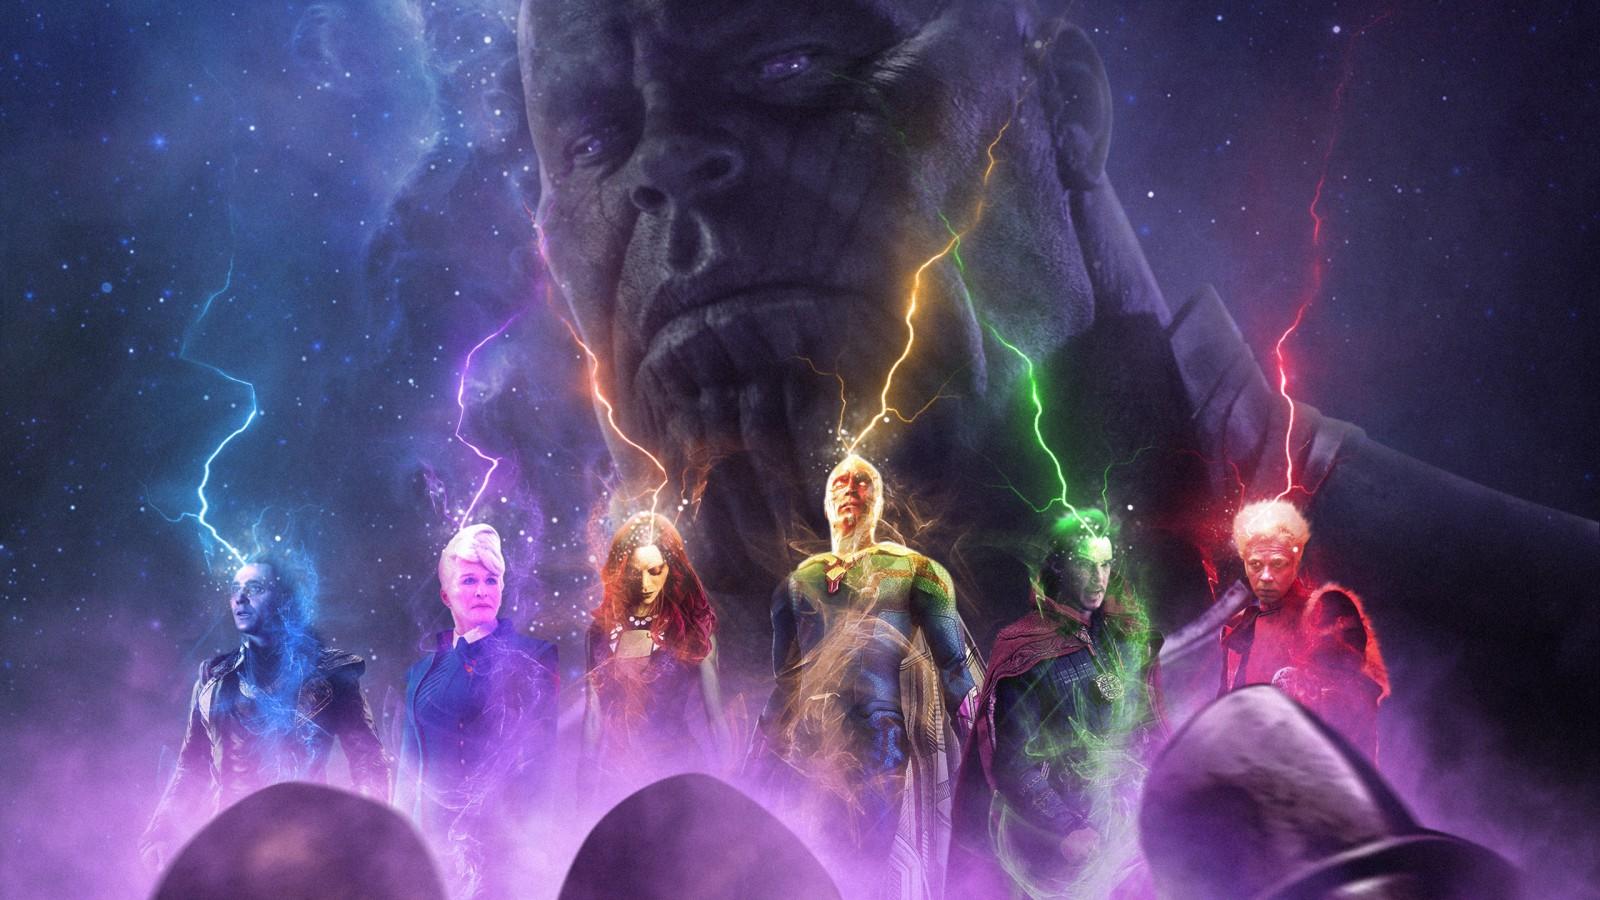 Cute Animals Hd Wallpapers 1080p Thanos Vs Avengers Wallpapers Hd Wallpapers Id 27716